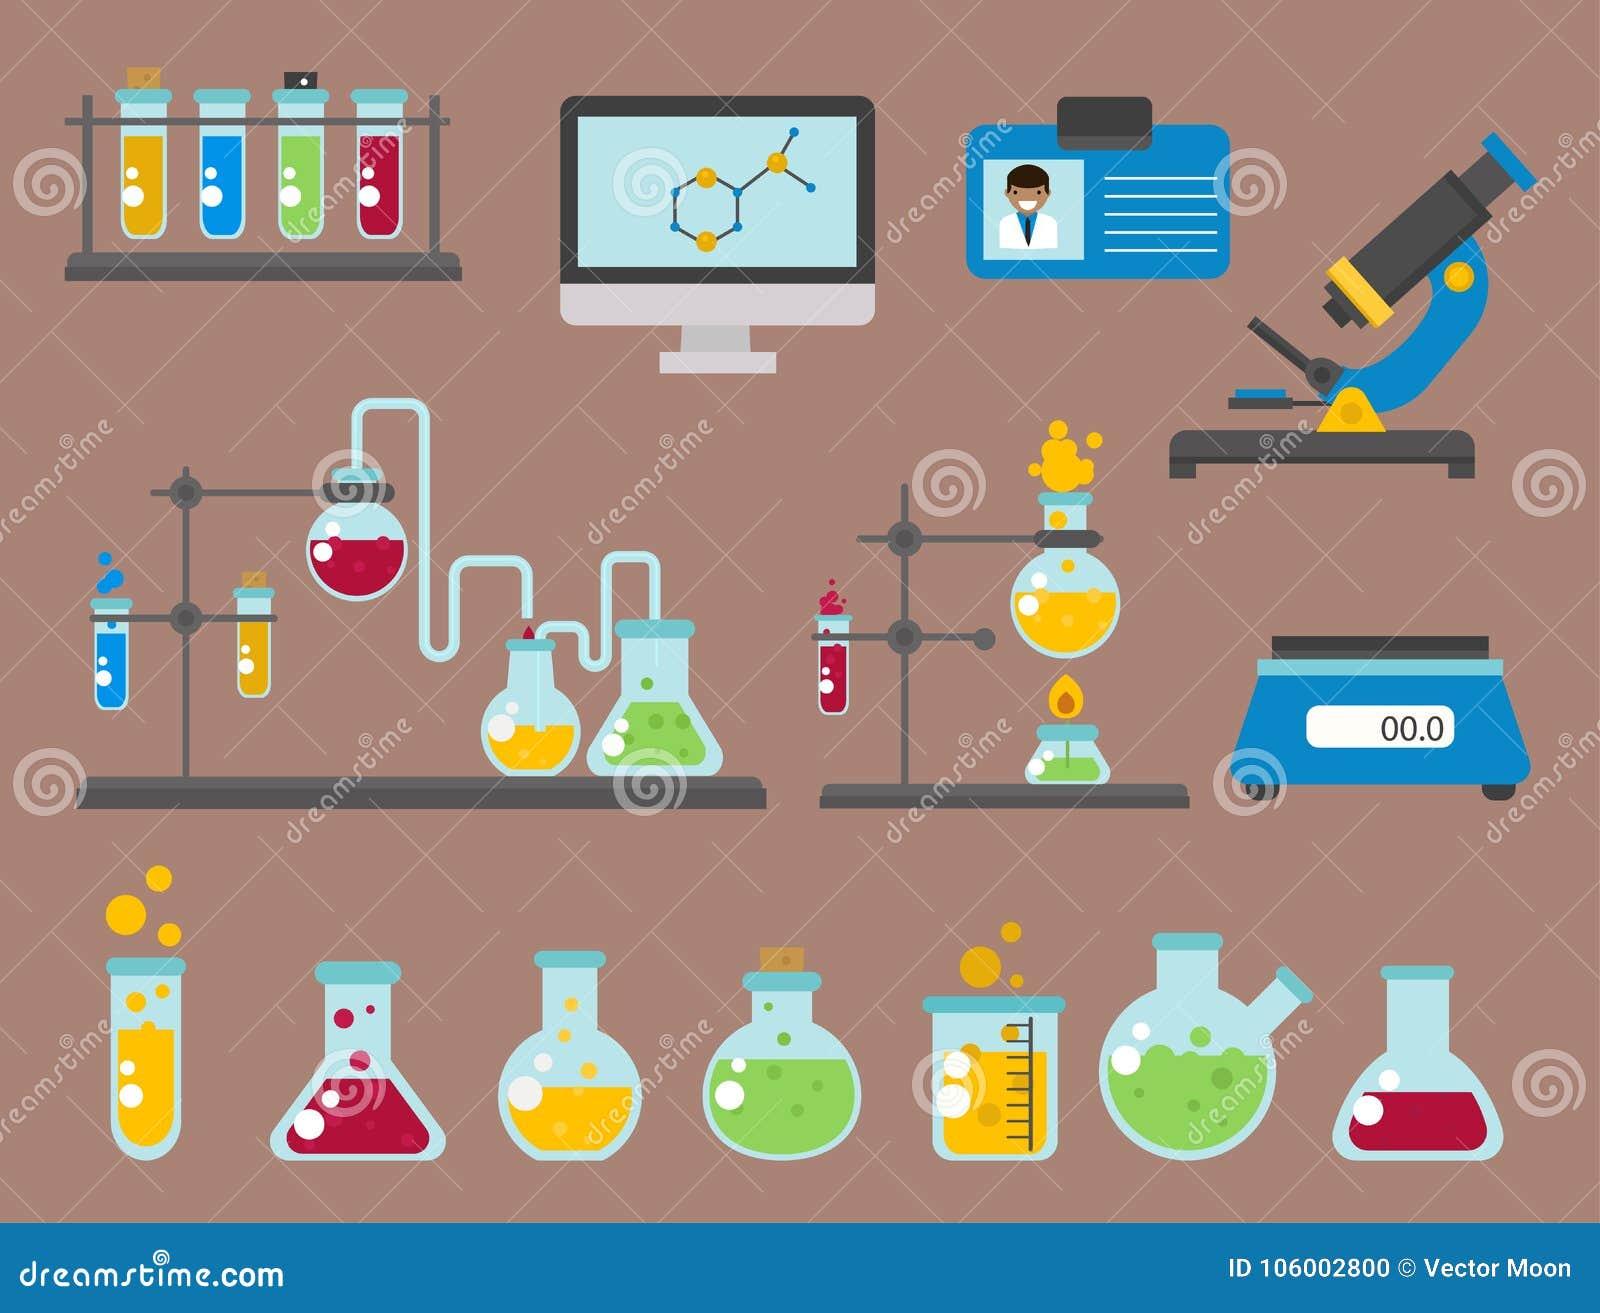 Lab symbols test medical laboratory scientific biology design biotechnology science chemistry icons vector illustration.